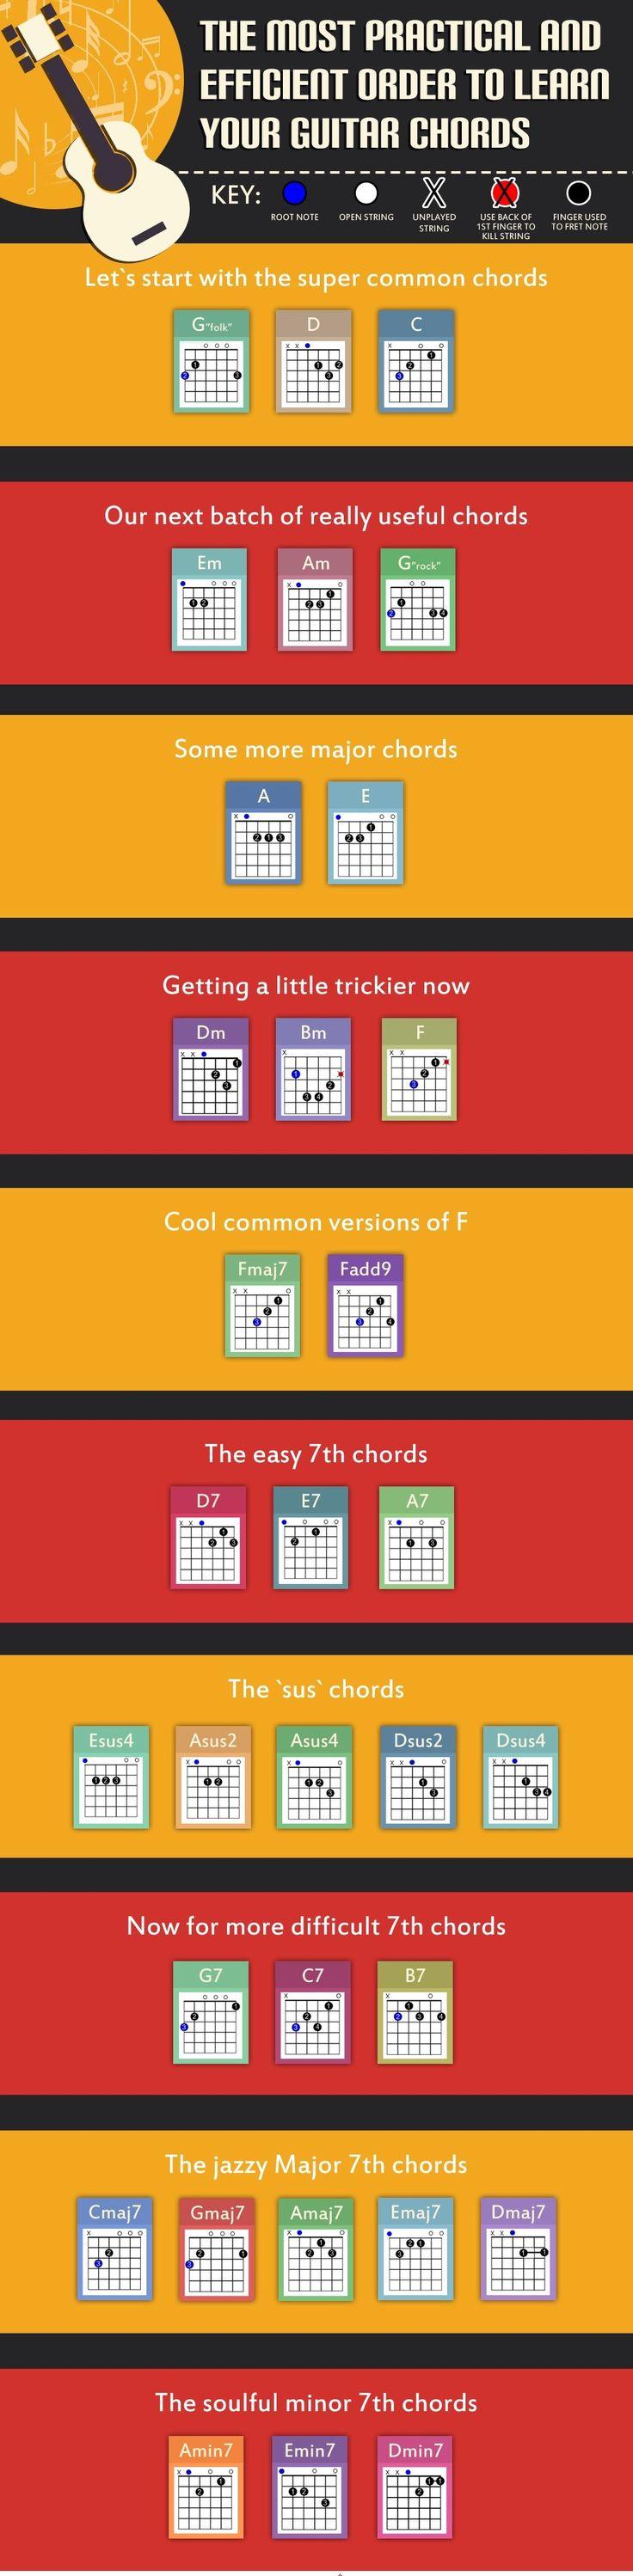 . - more on www.guitaristica.org #guitartutorials #guitarlessons #guitars #guitaristica